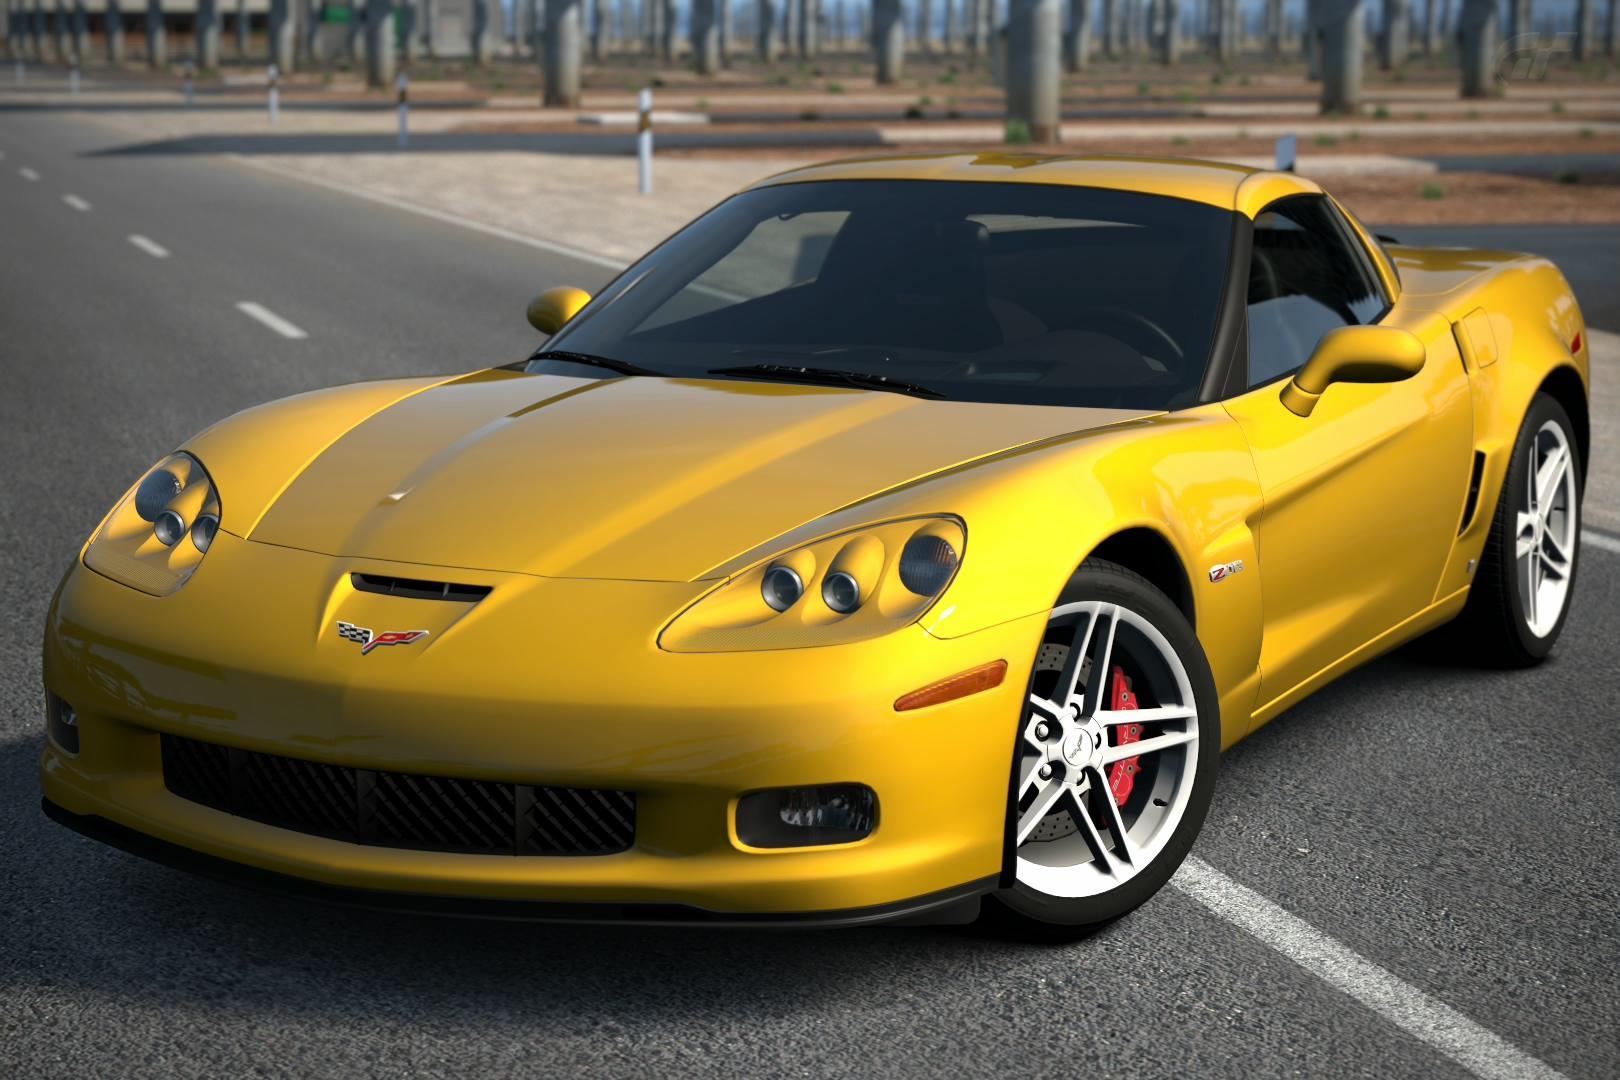 Chevrolet Corvette C6 Gran Turismo Wiki Fandom Powered By Wikia